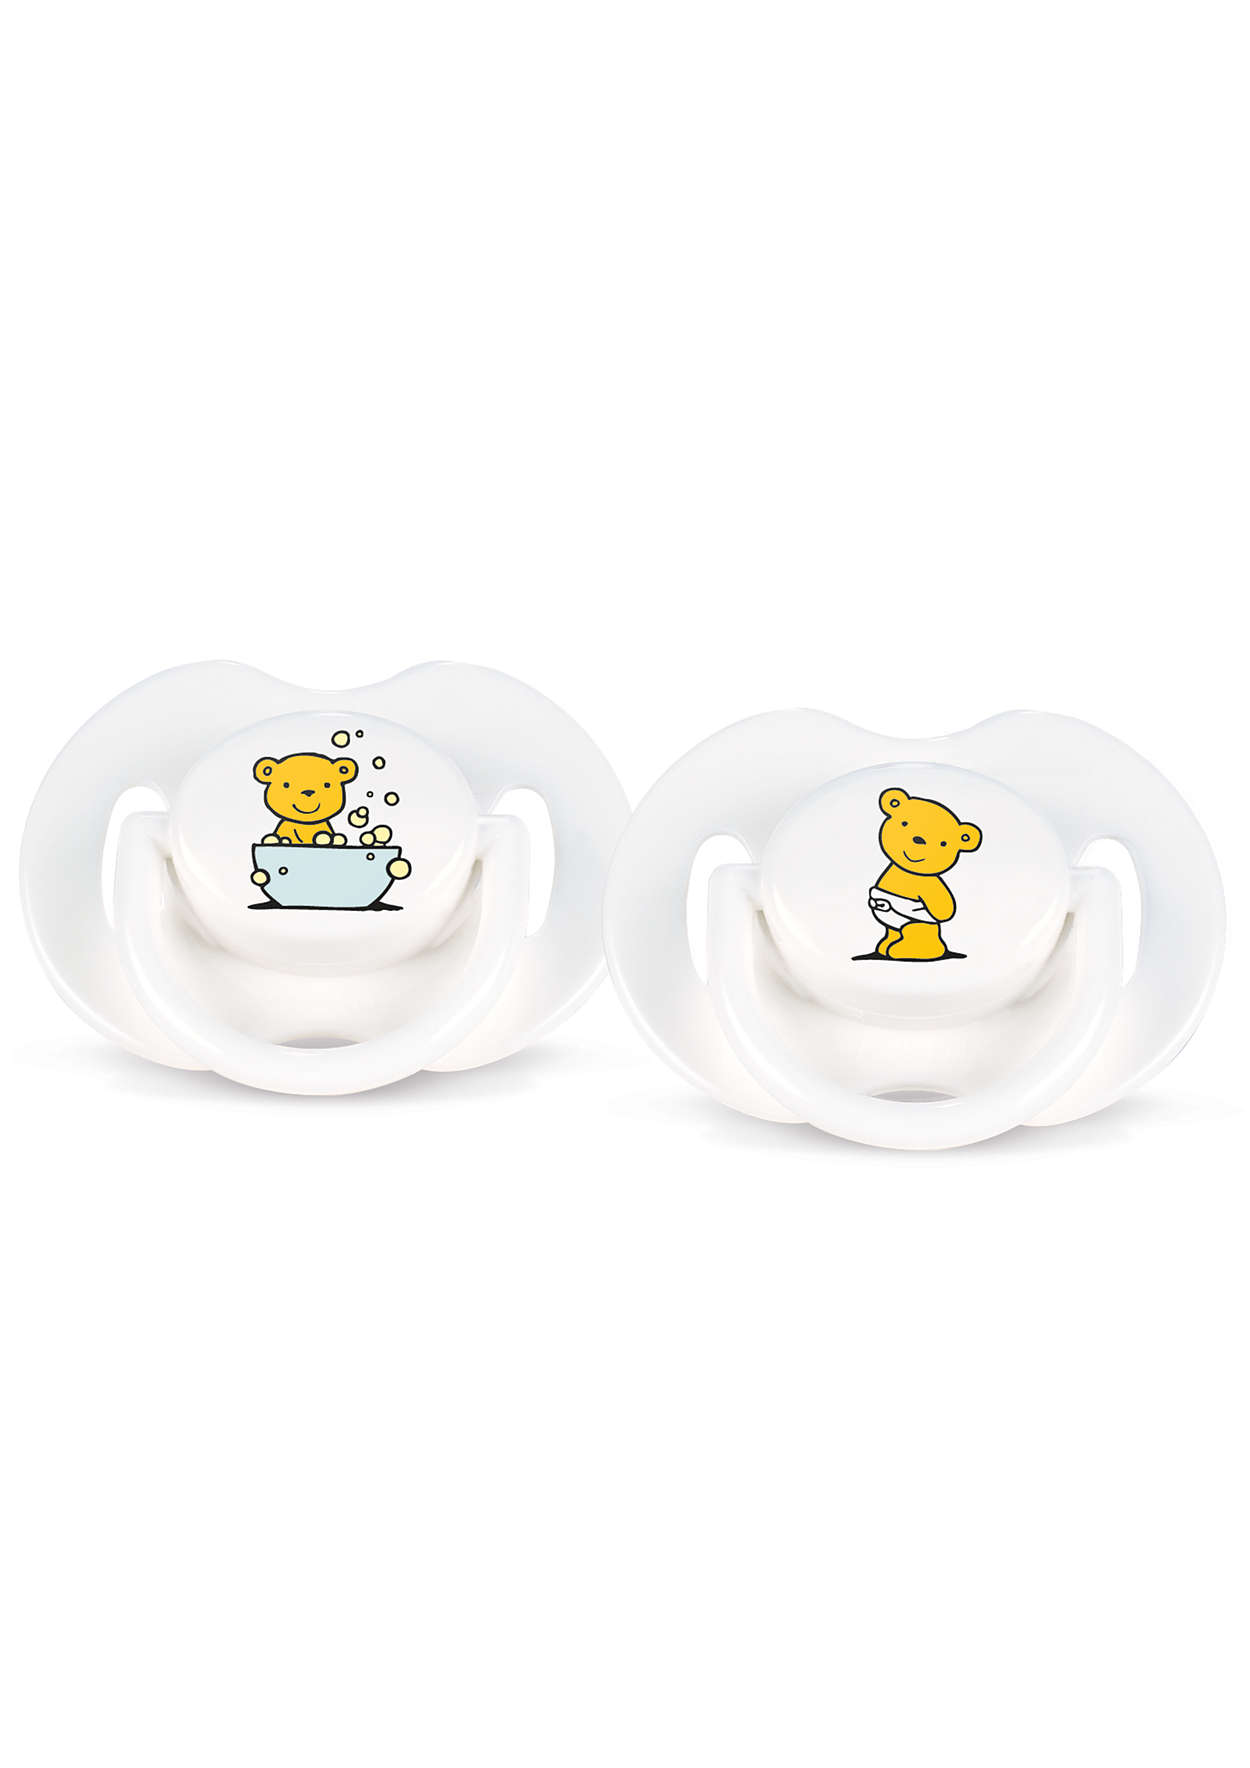 Orthodontiques, 0% BPA